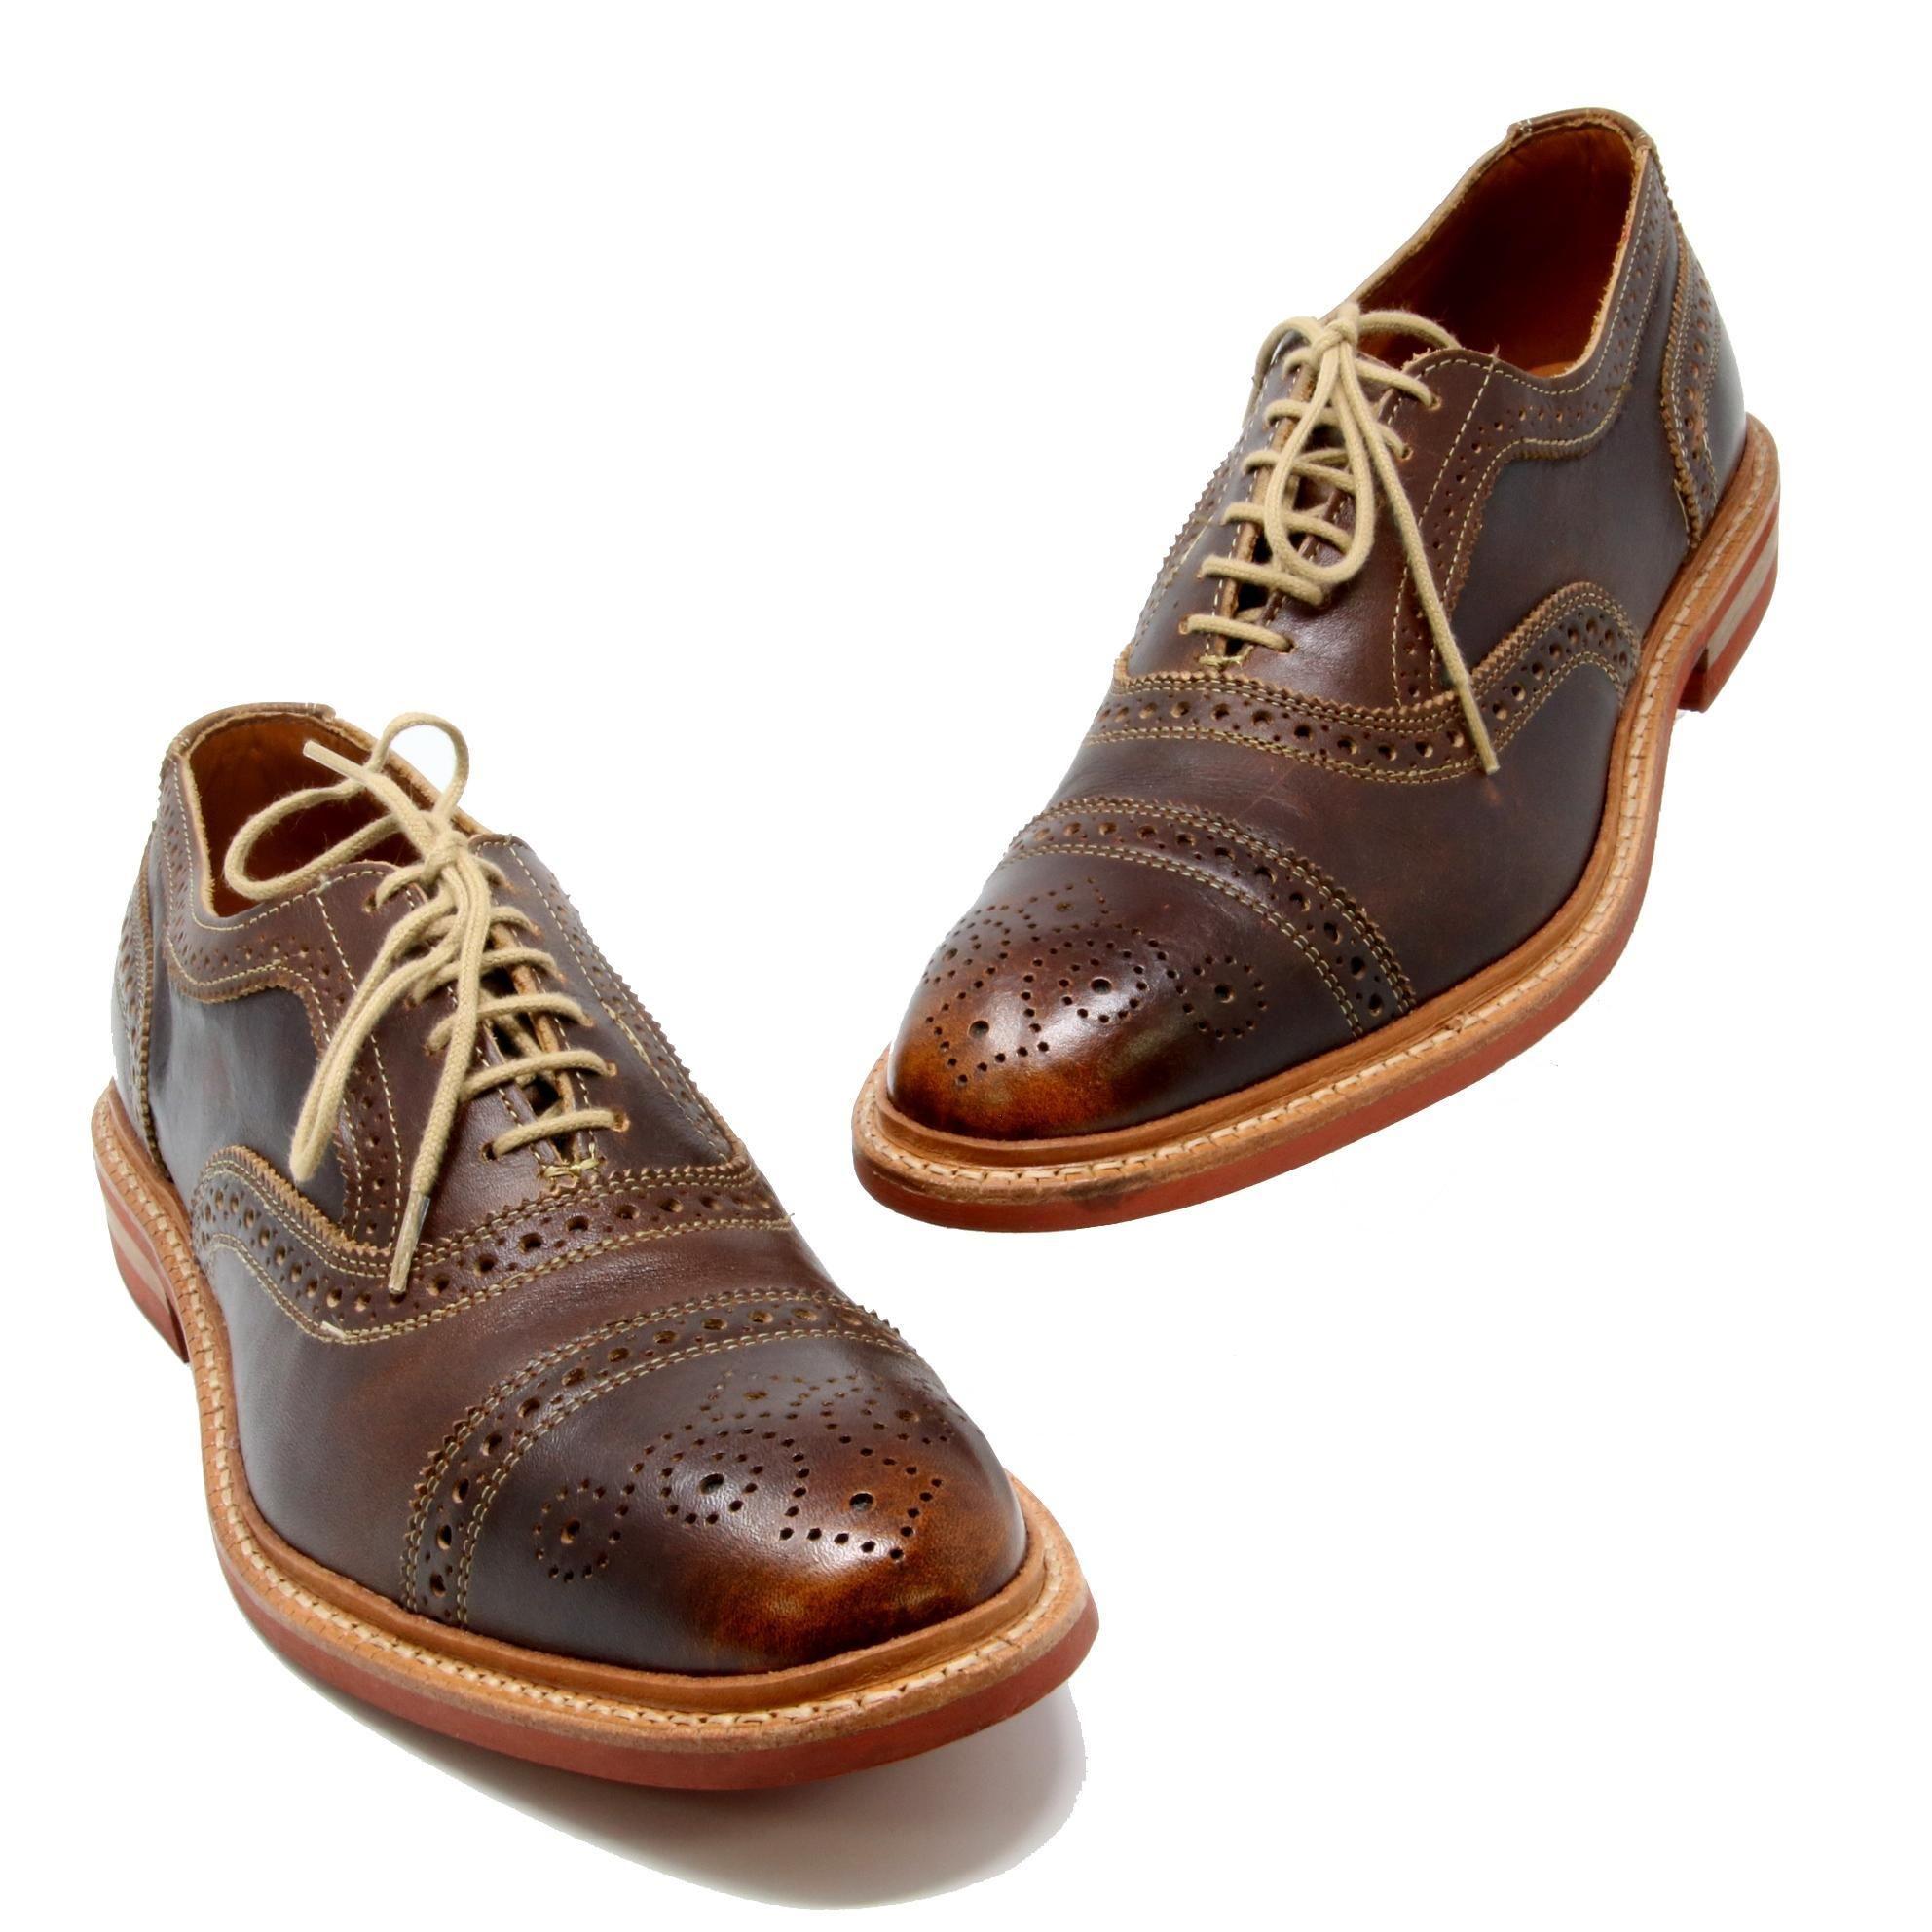 20b2046a7c4b Christian Louboutin Yang Louis Junior Flat Low Leather Sneakers ...